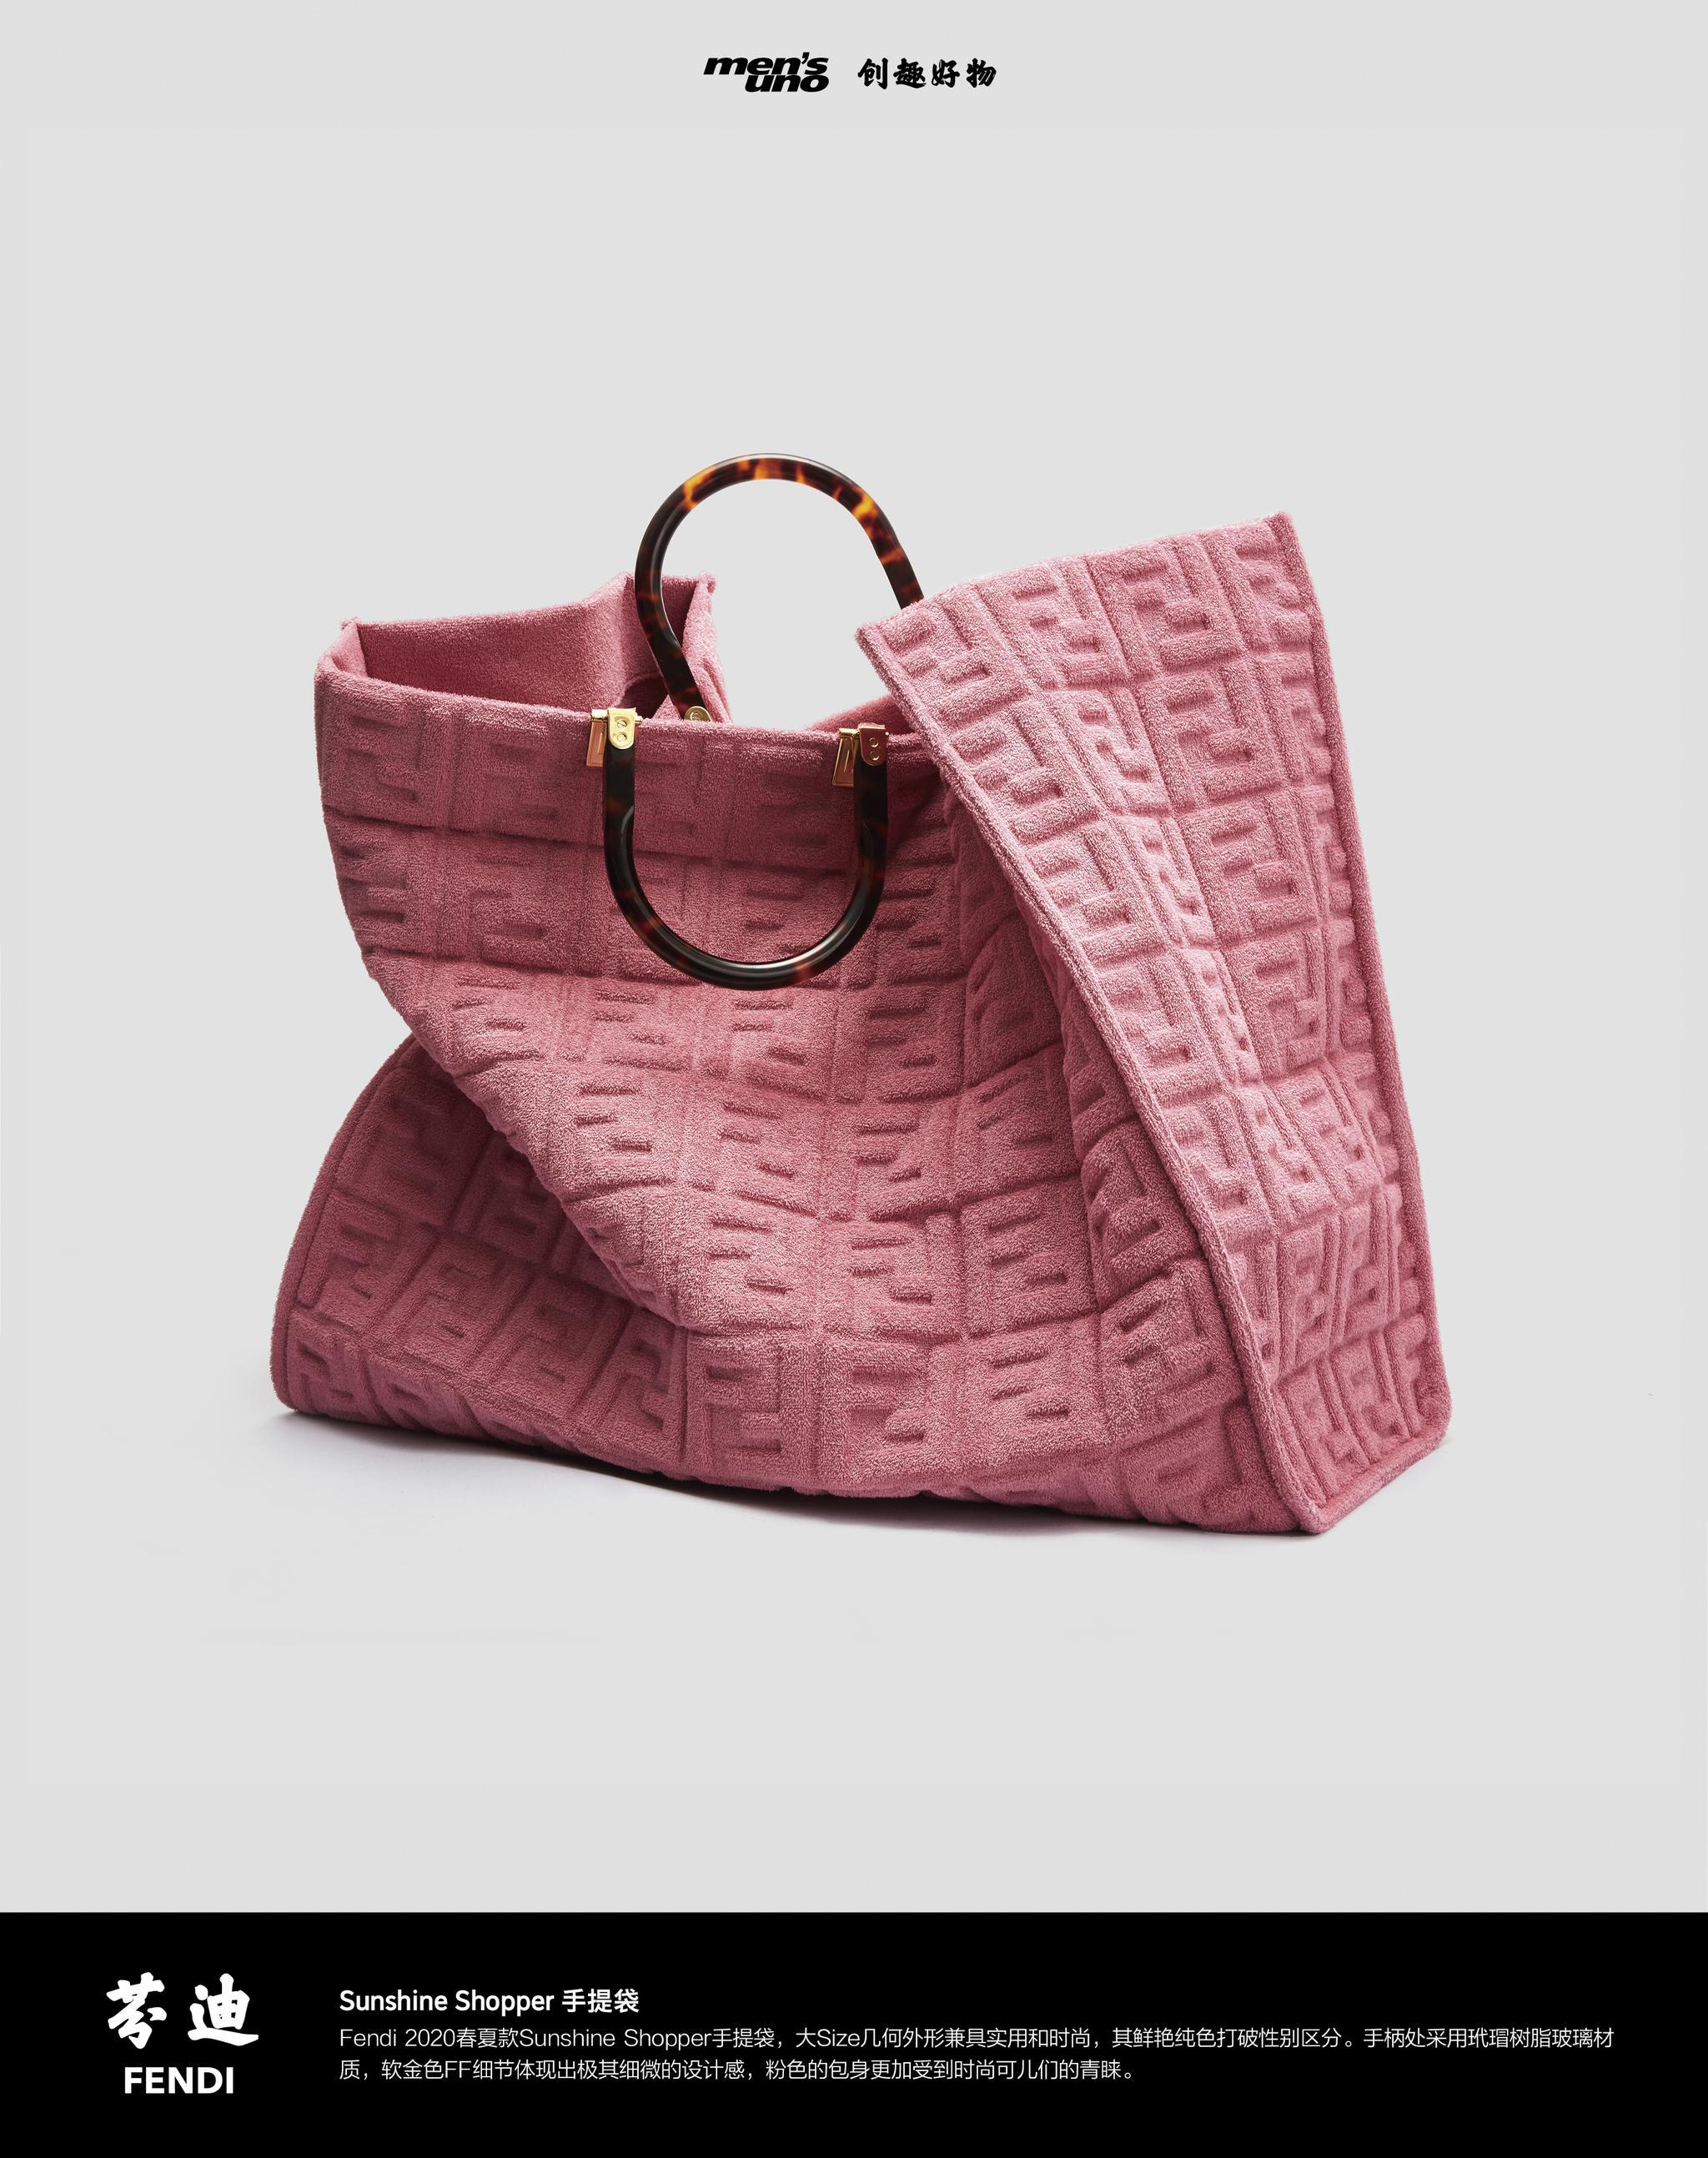 Fendi 2020春夏款Sunshine Shopper手提袋……